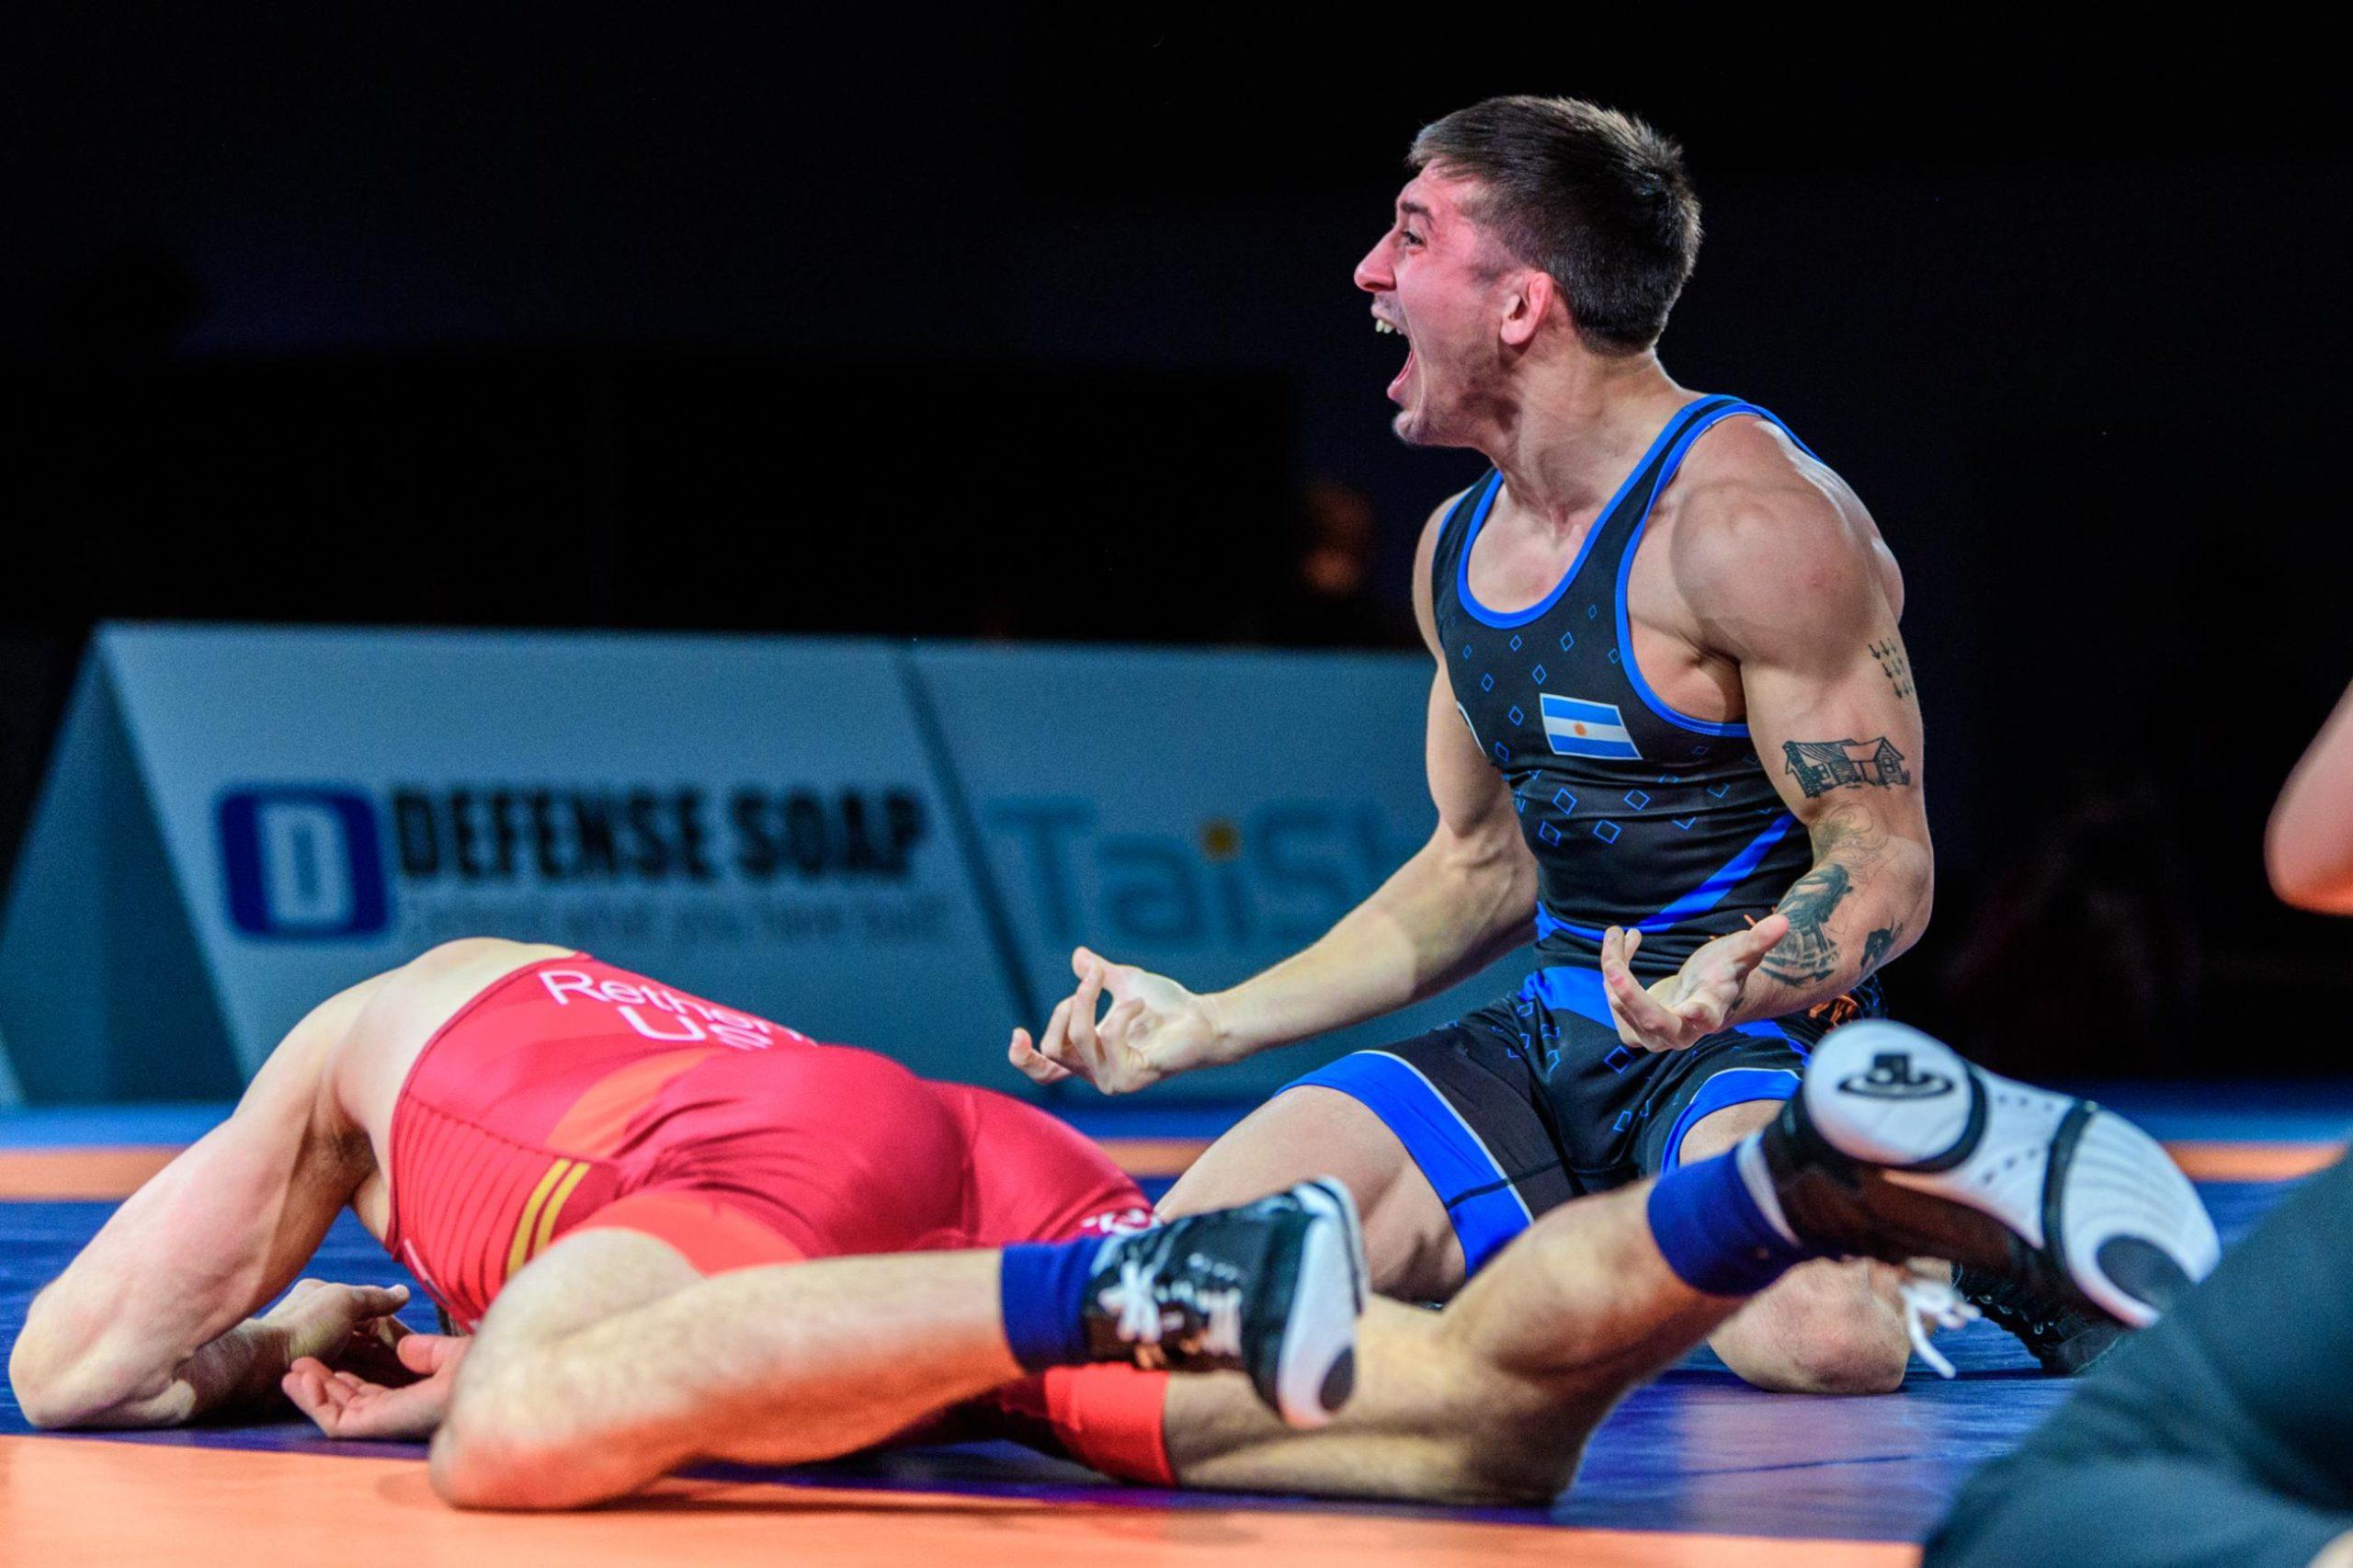 Lucha Olímpica: Clasificatorio Panamericano en Ottawa, primeros boletos para Tokio 2020 4